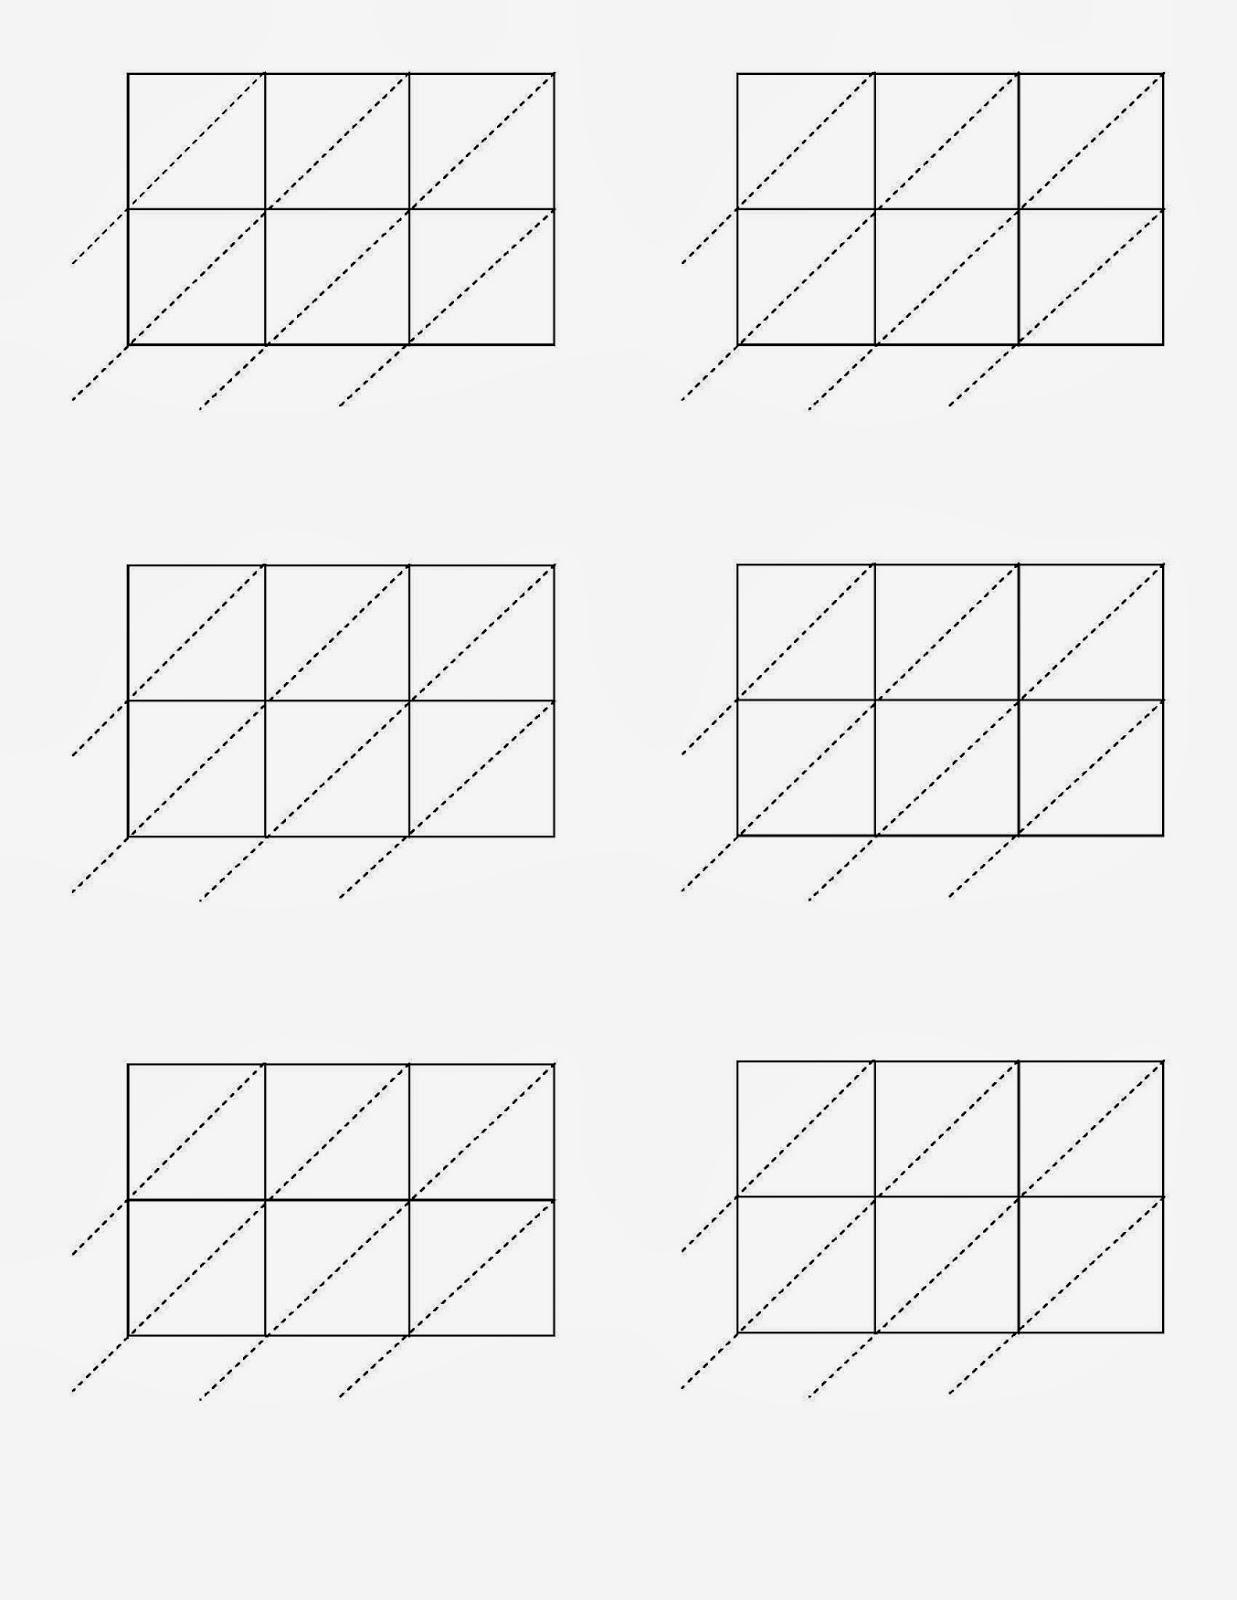 Blank Lattice Worksheet